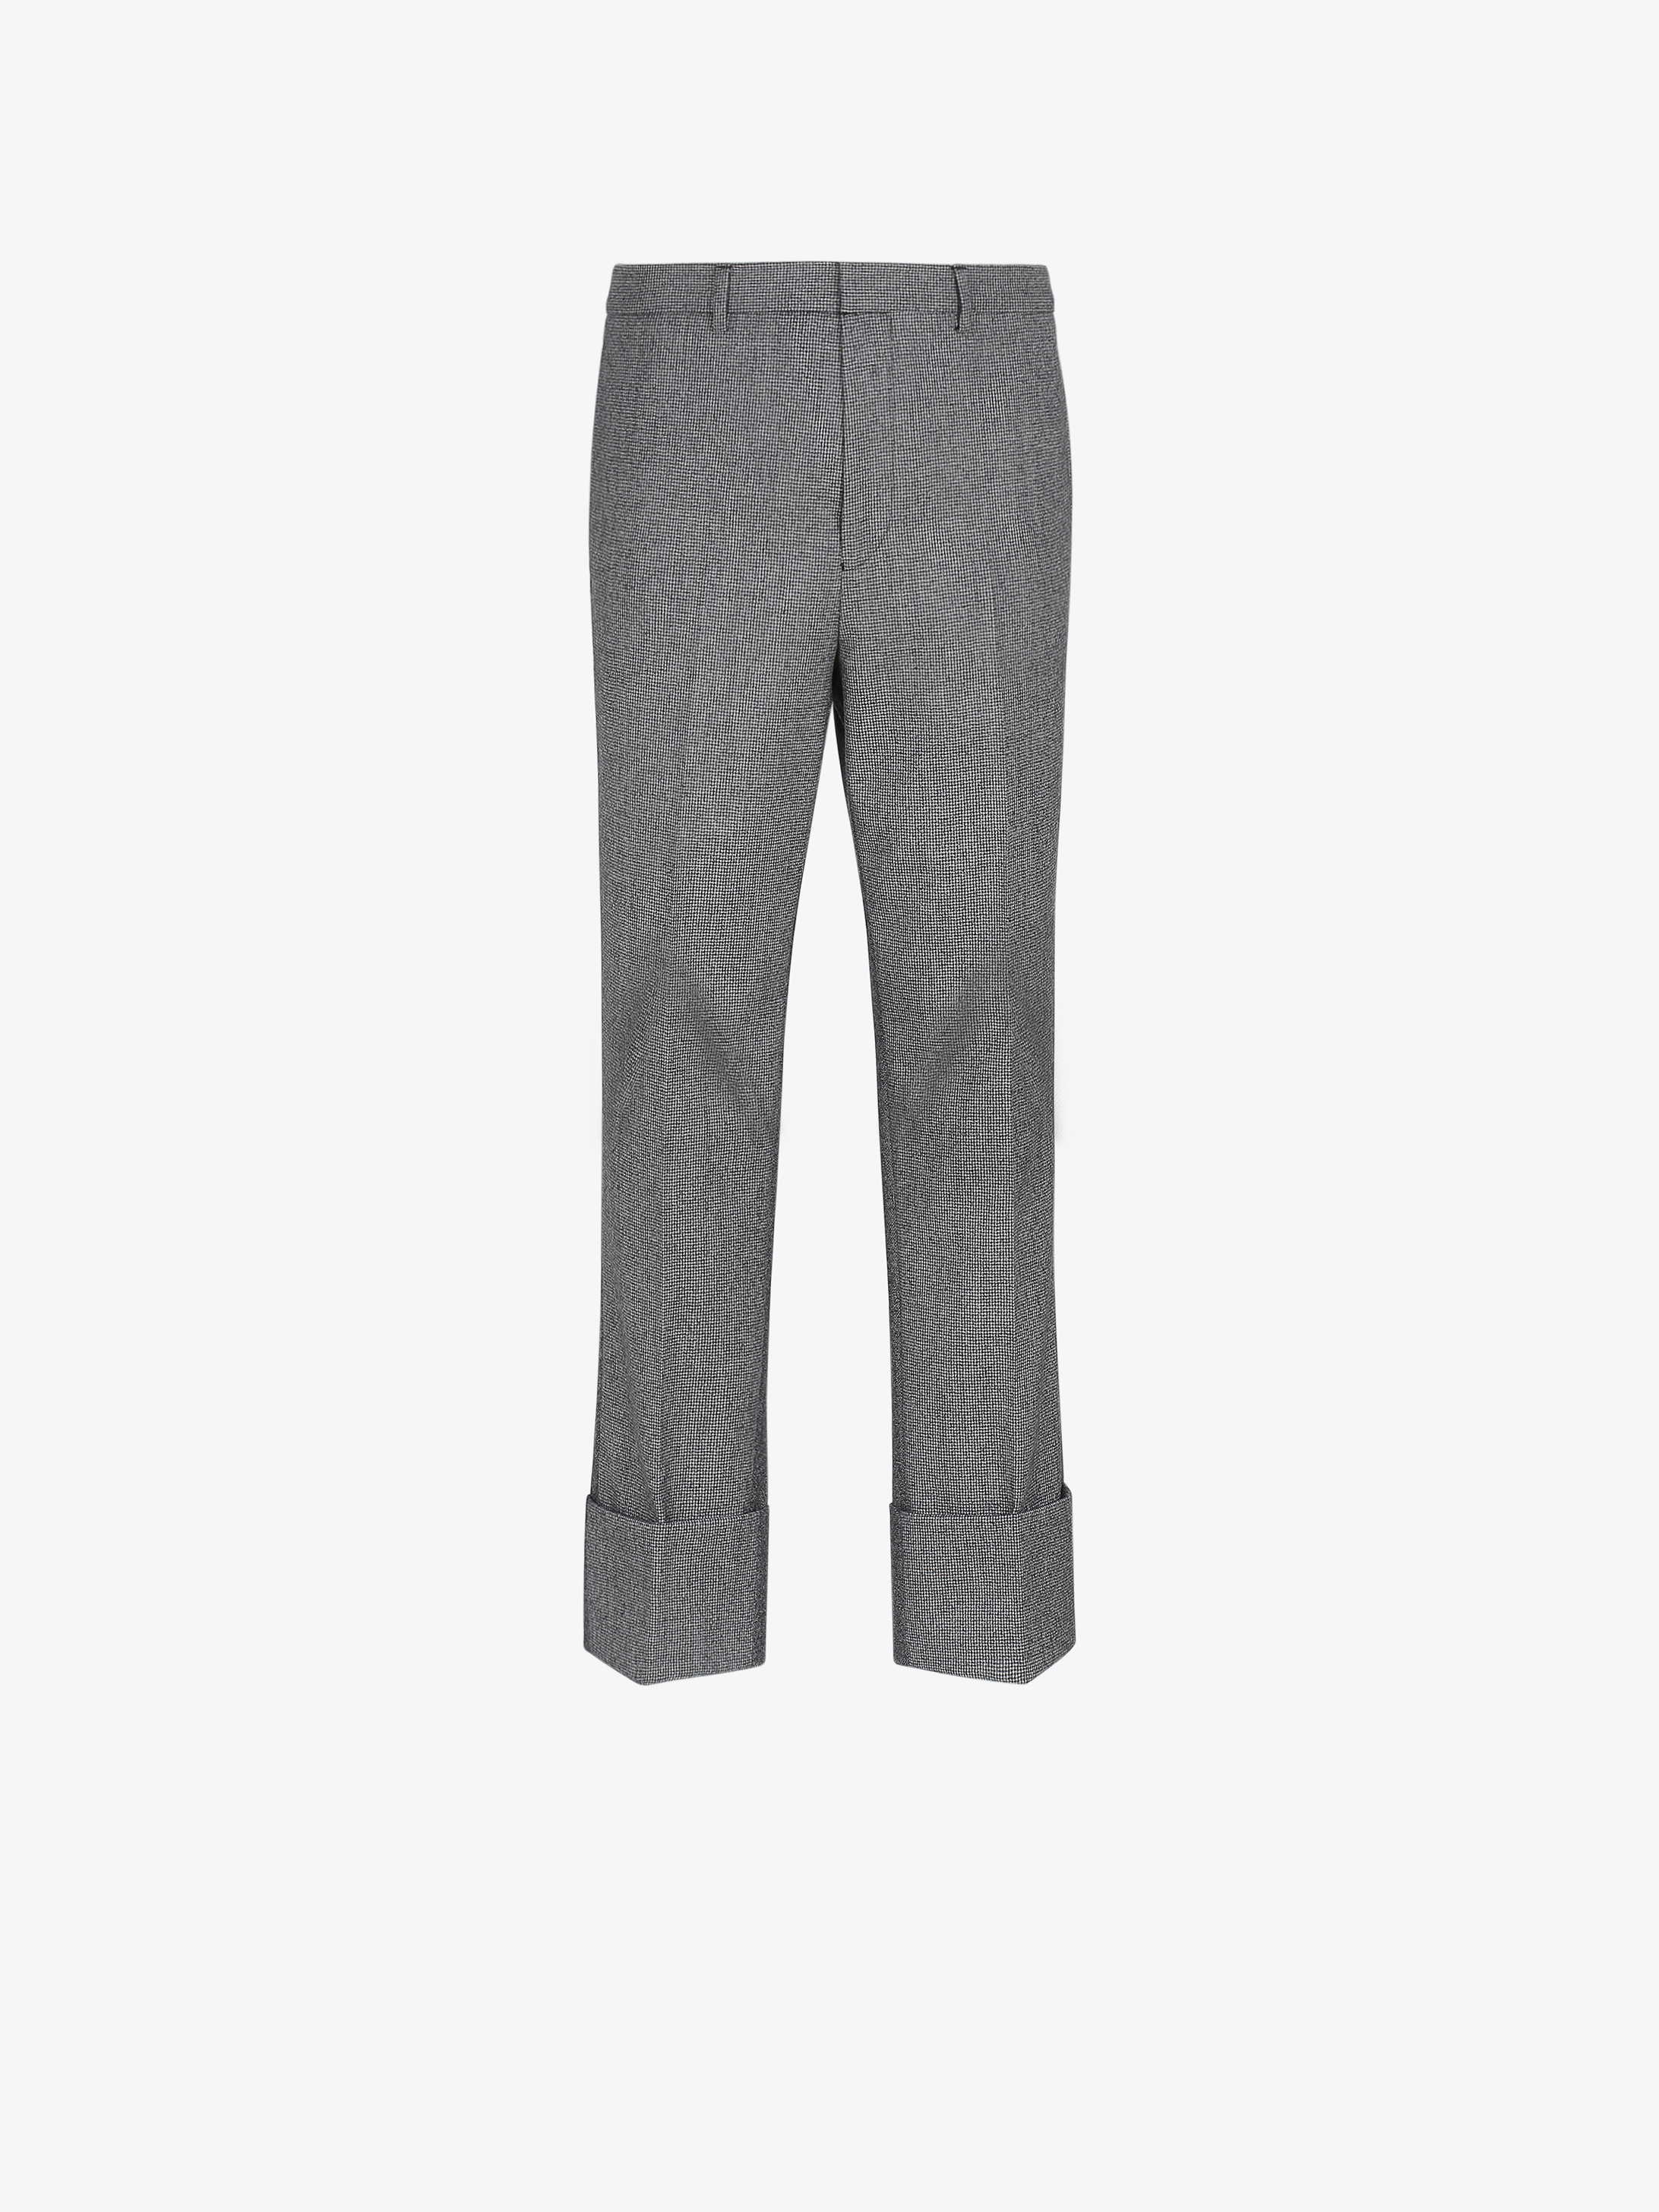 Pantalon slim bimatière à revers